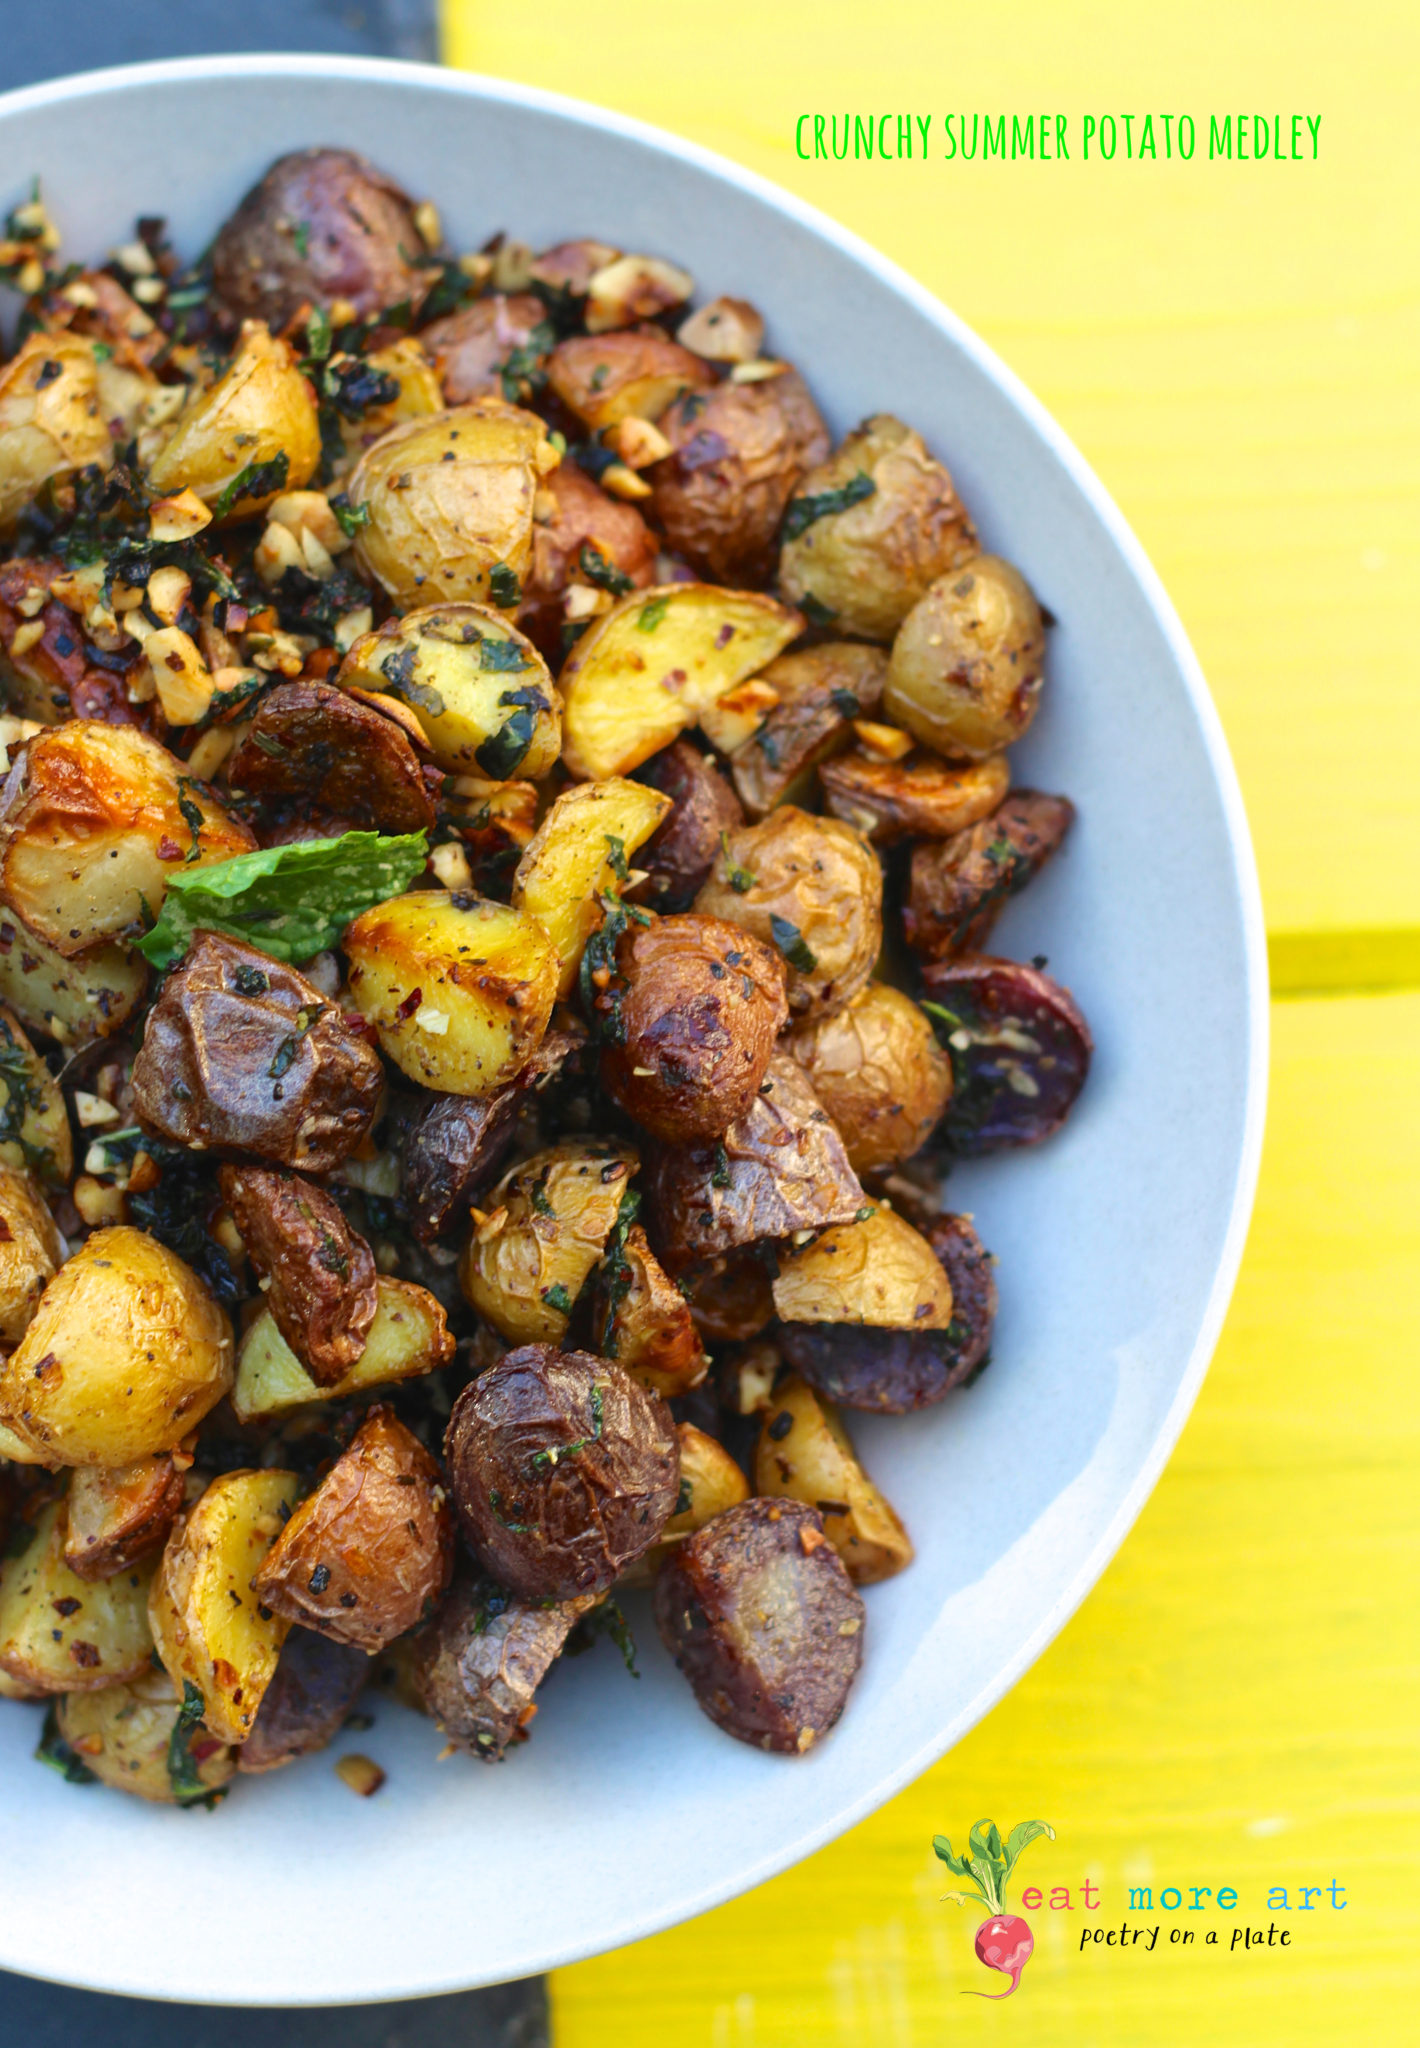 Crunchy Summer Potato Medley IMG_9336